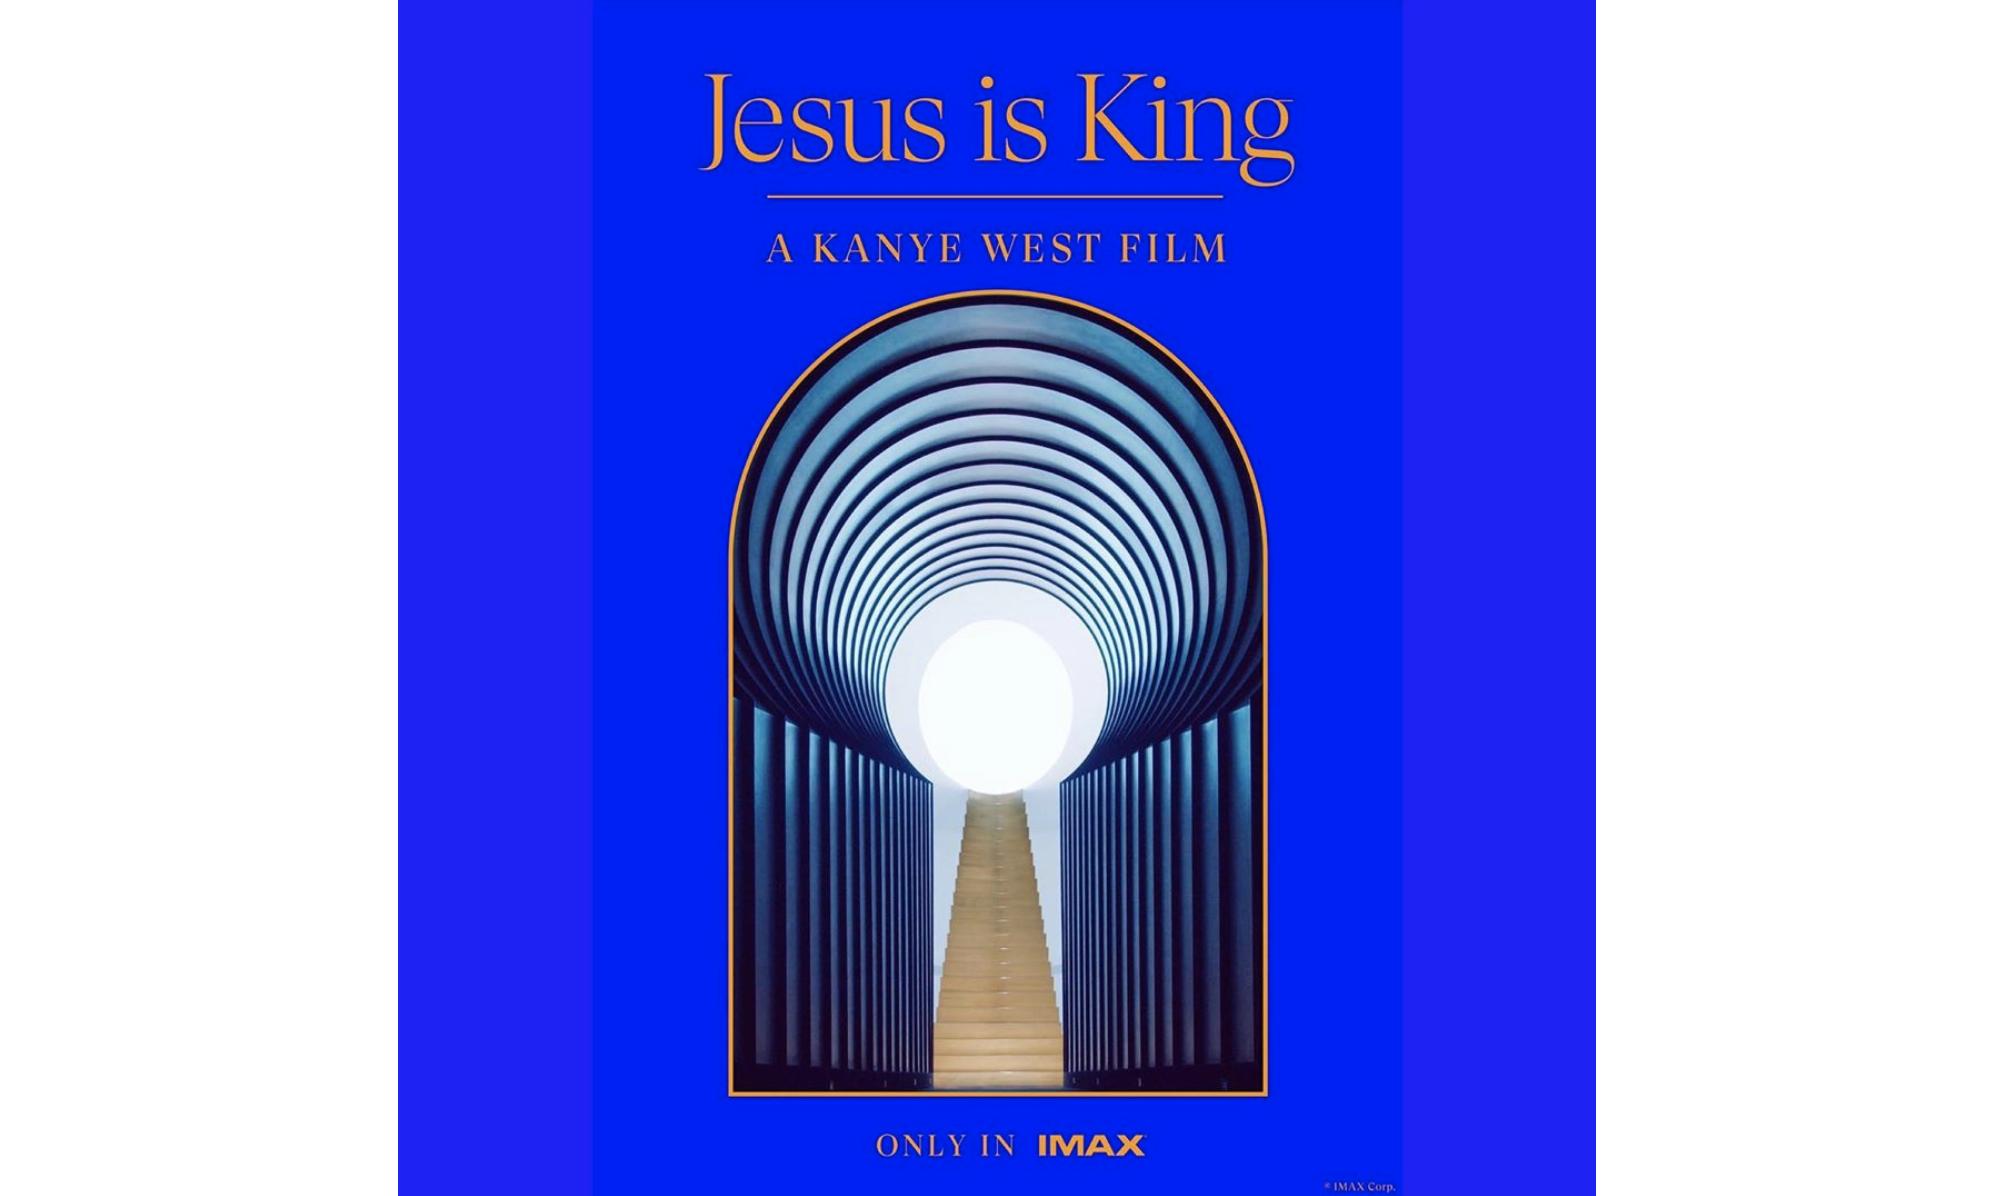 Kanye 新专辑《Jesus Is King》同名纪录片将于下月上映